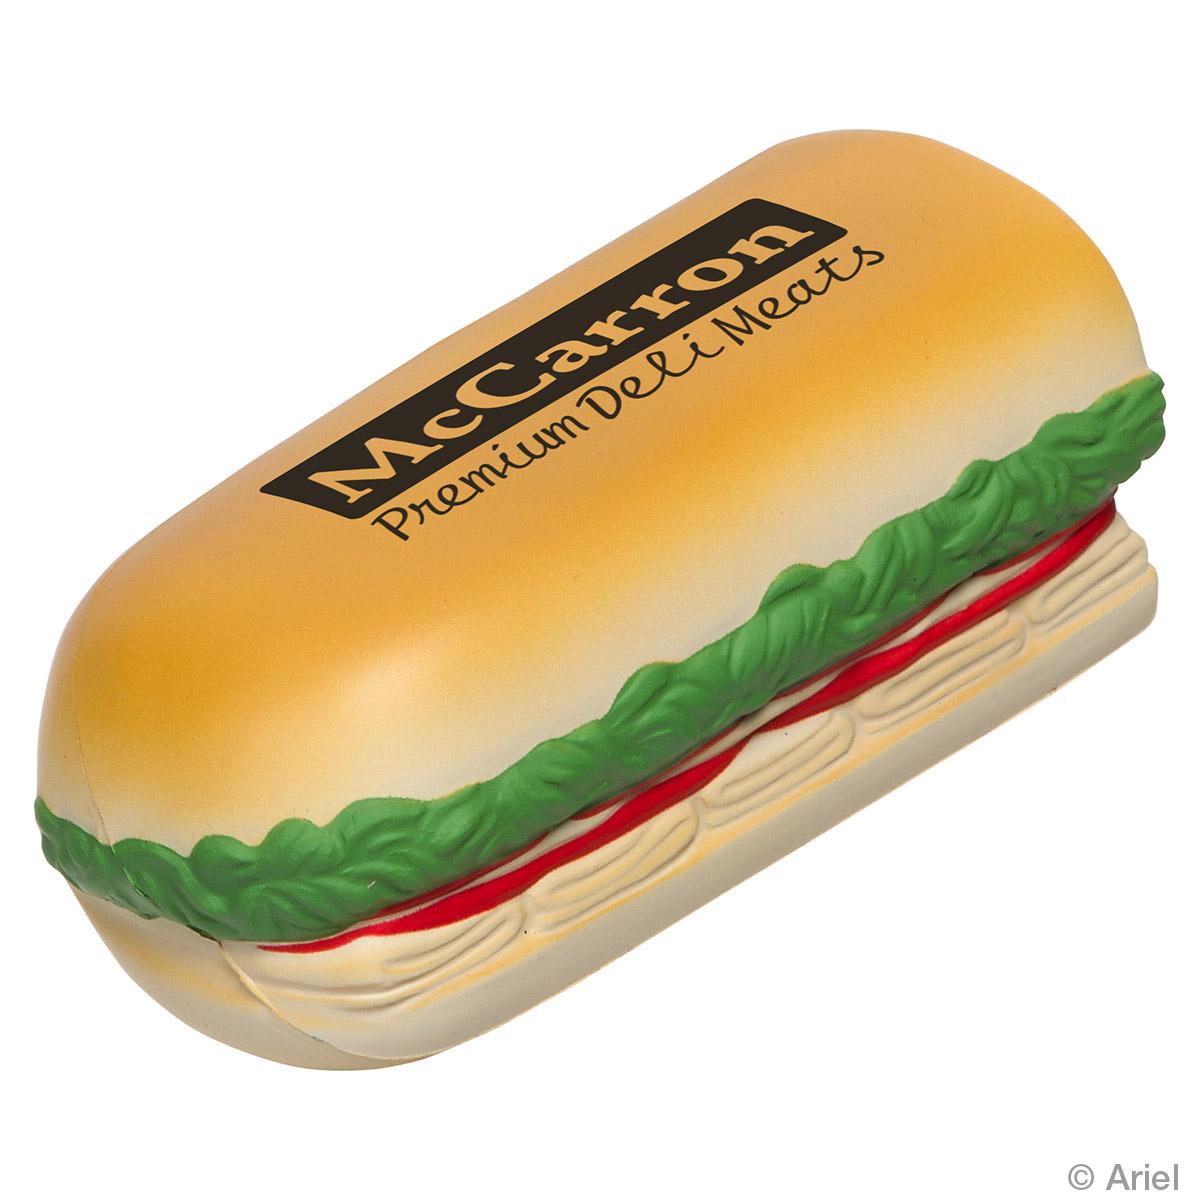 Sub Sandwich Stress Reliever, LFD-SS17, 1 Colour Imprint